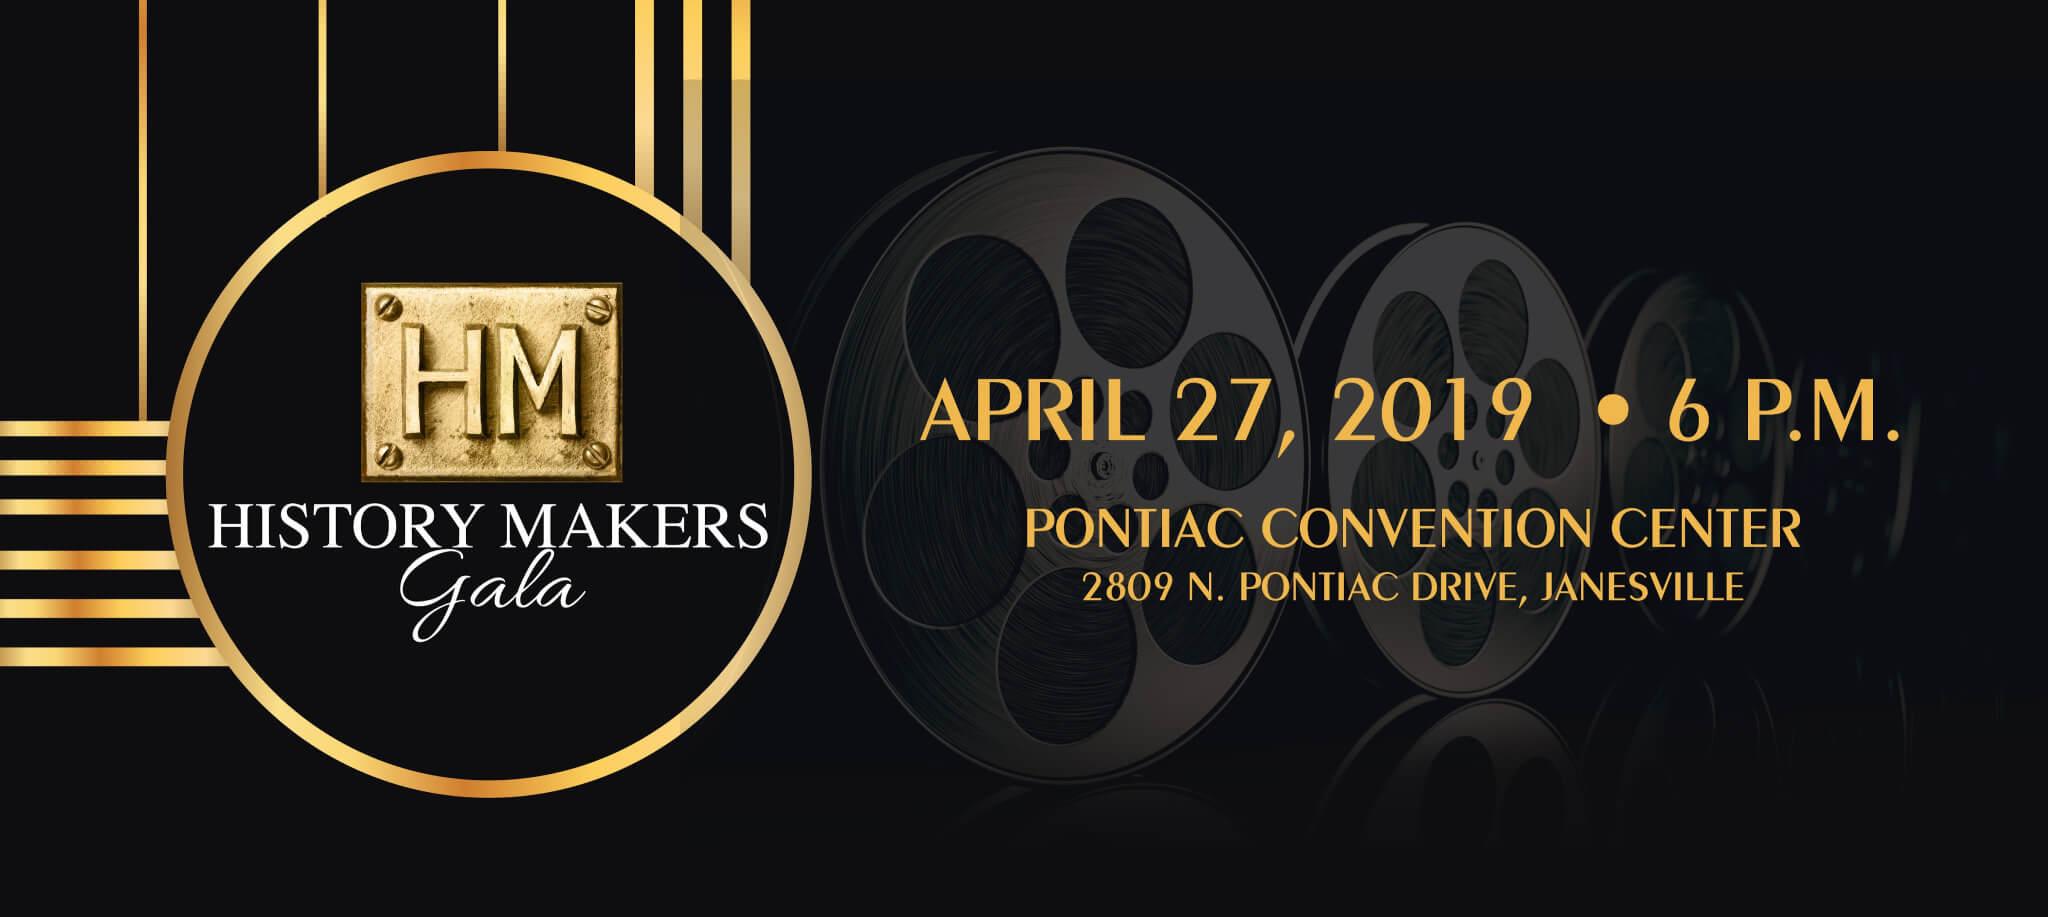 History Makers Gala 2019